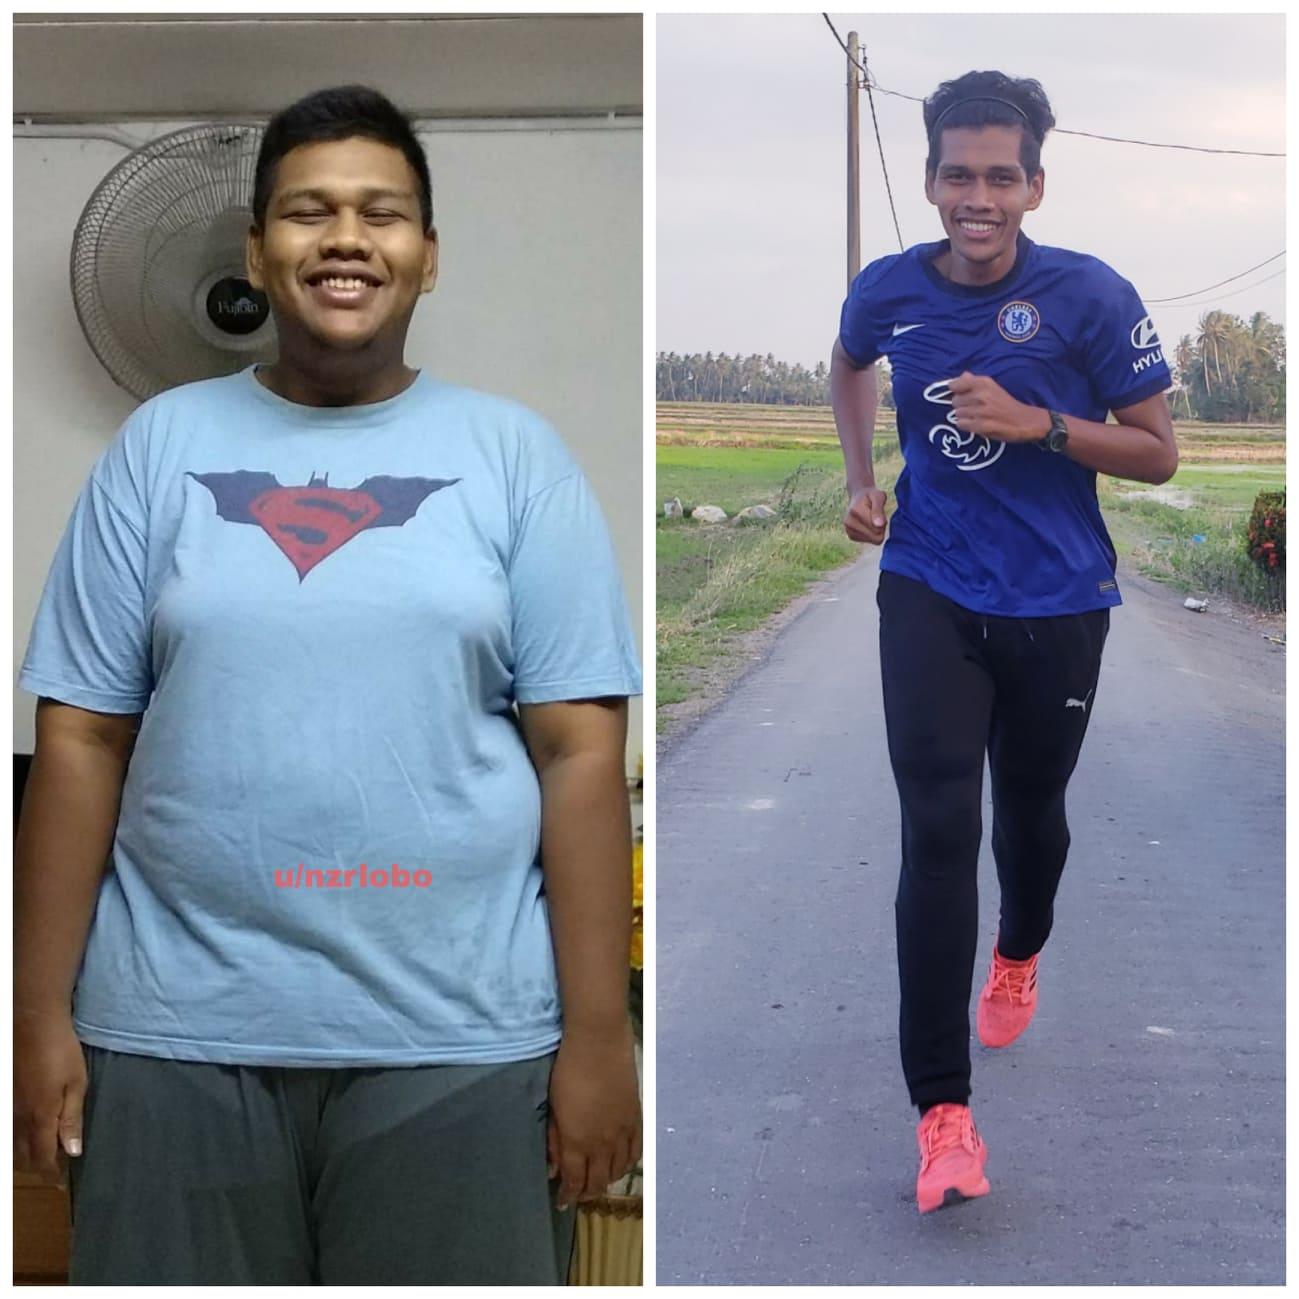 6 foot 3 Male 160 lbs Fat Loss 360 lbs to 200 lbs